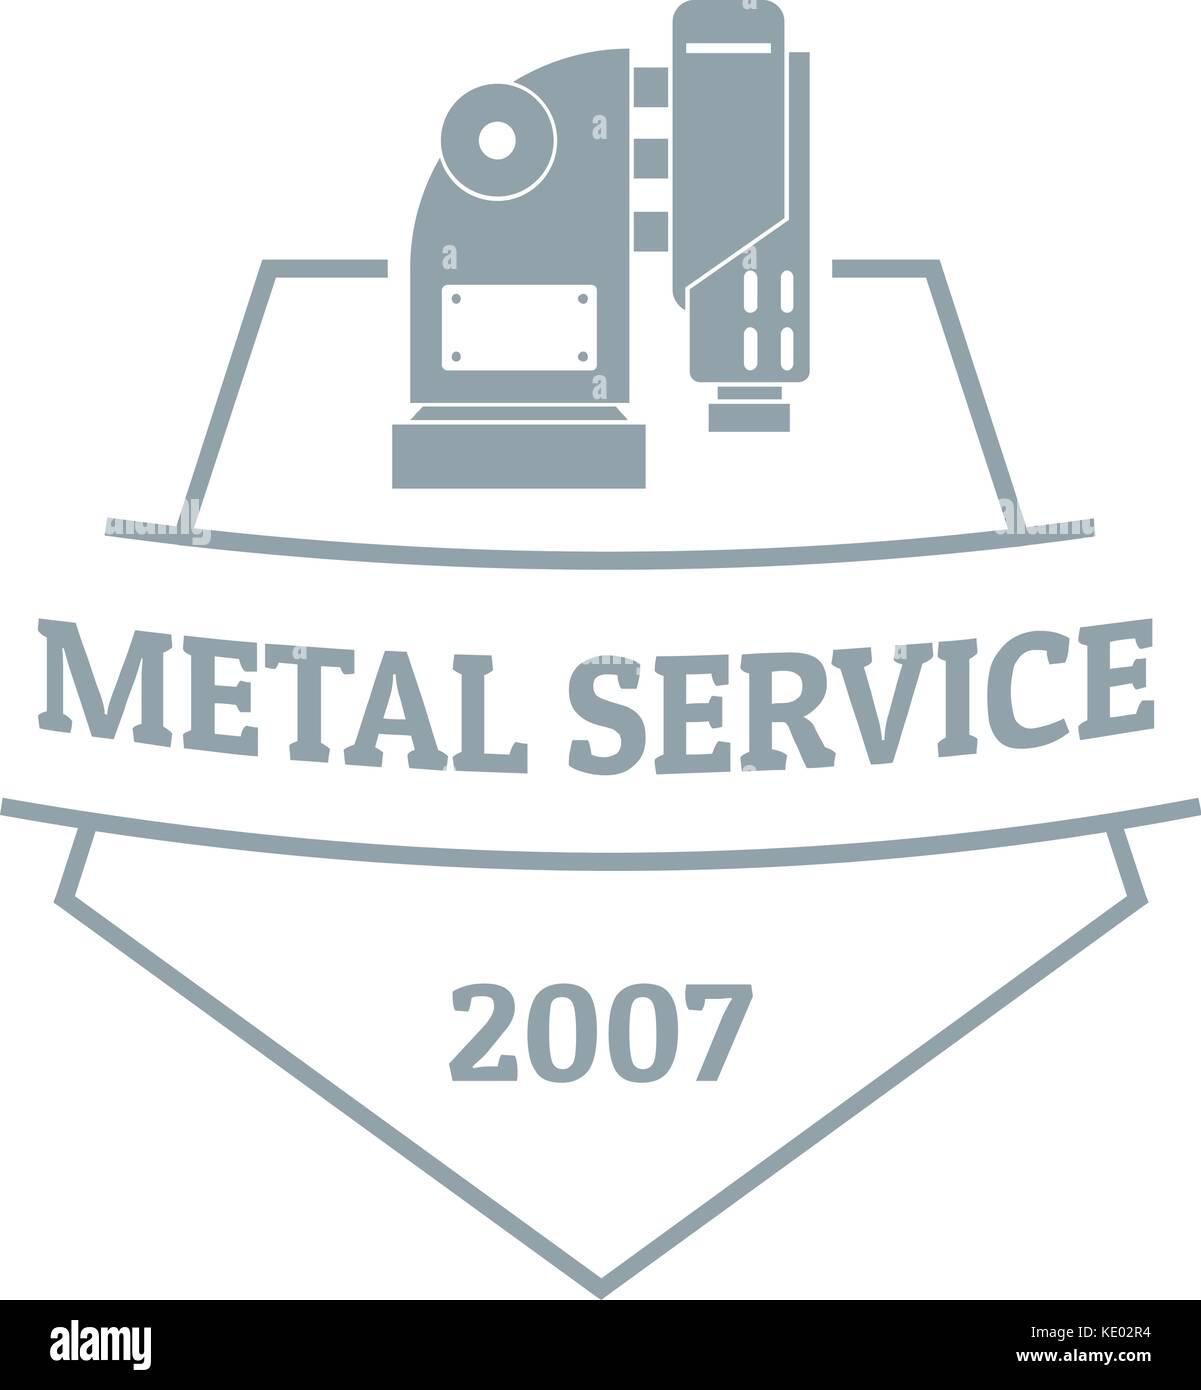 Mechanic service logo, vintage style - Stock Vector